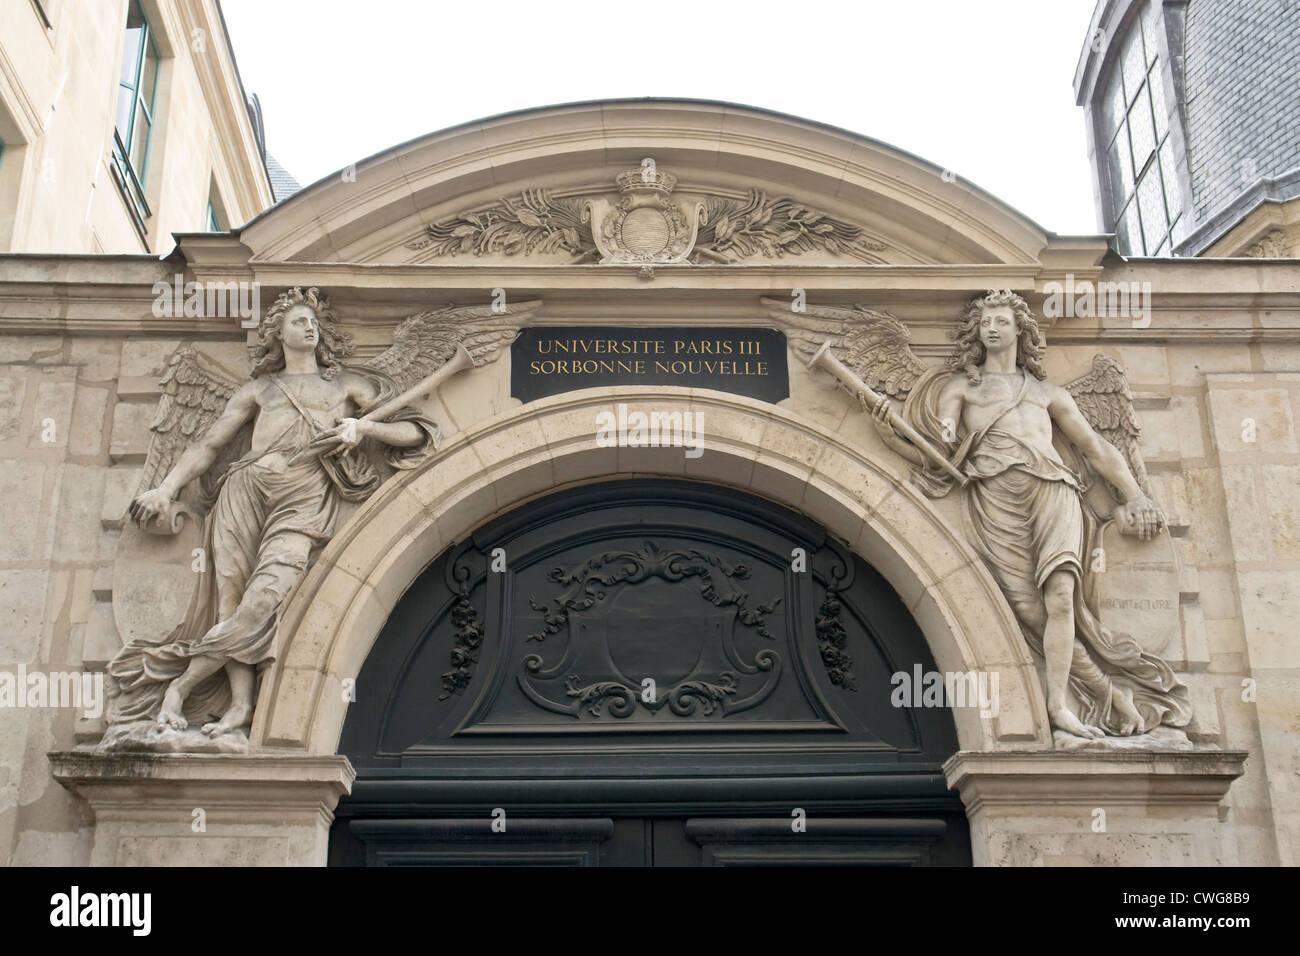 ecole royale de dessin entrance paris stock photo royalty free image 50144957 alamy. Black Bedroom Furniture Sets. Home Design Ideas